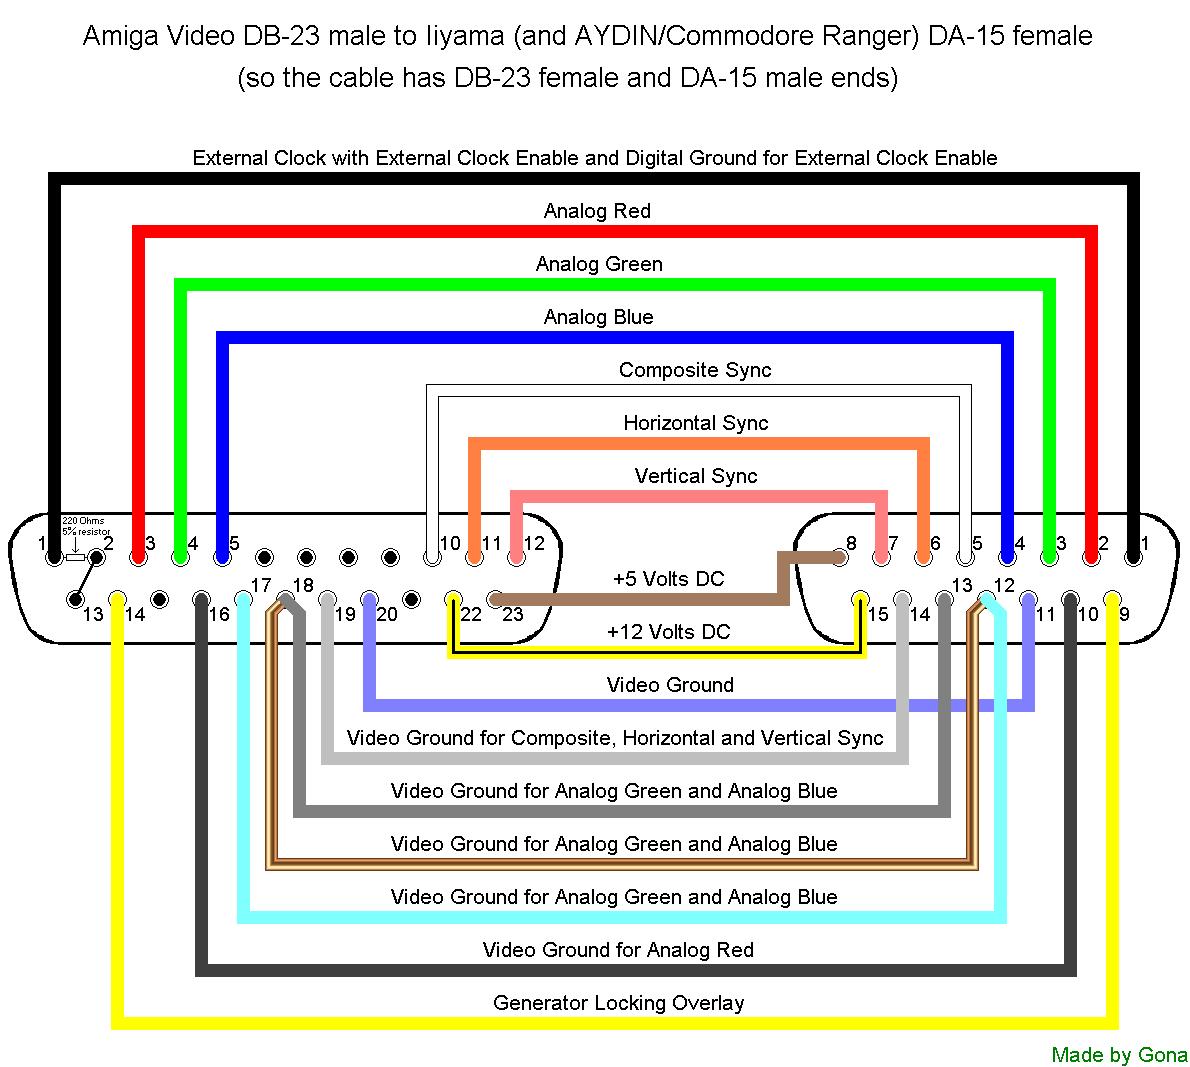 15 pin rgb cable diagram wiring diagram for light switch amiga rgb to iiyama da 15 pinout rh gona mactar hu displayport connector vga connector pinout publicscrutiny Gallery